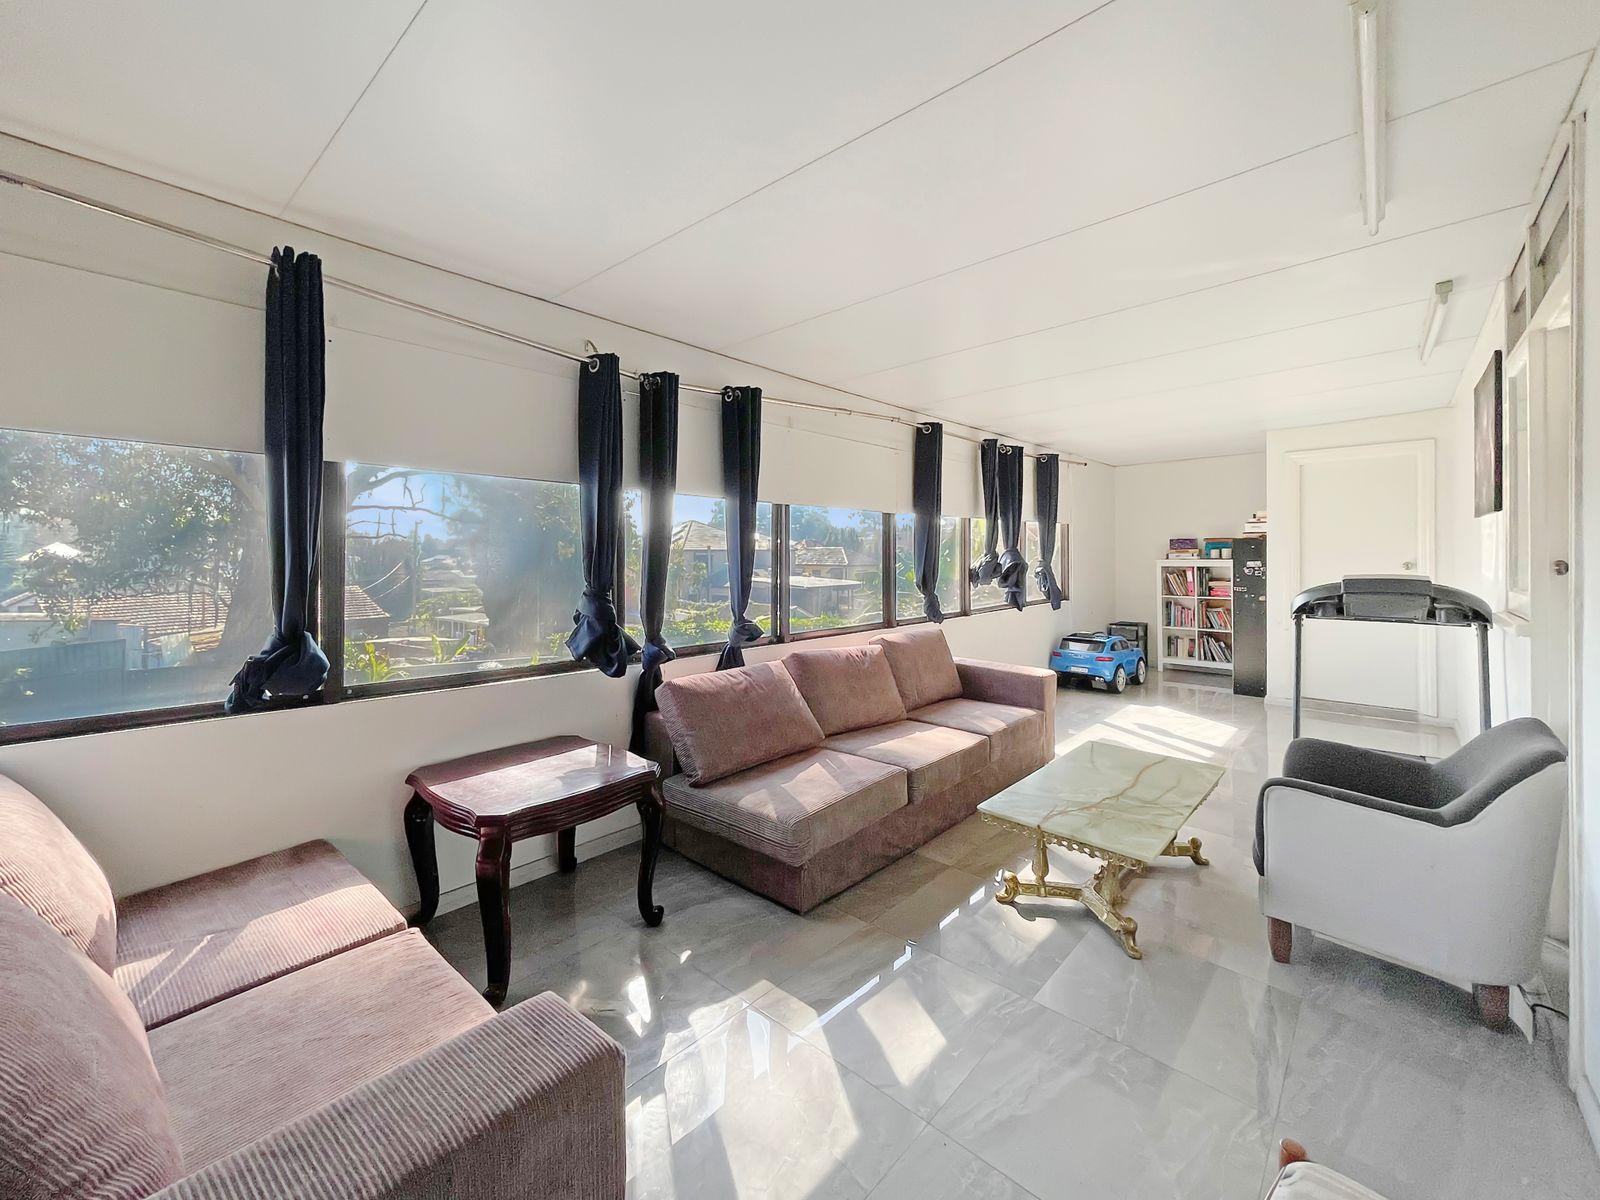 533 Hume Highway, Villawood, NSW 2163